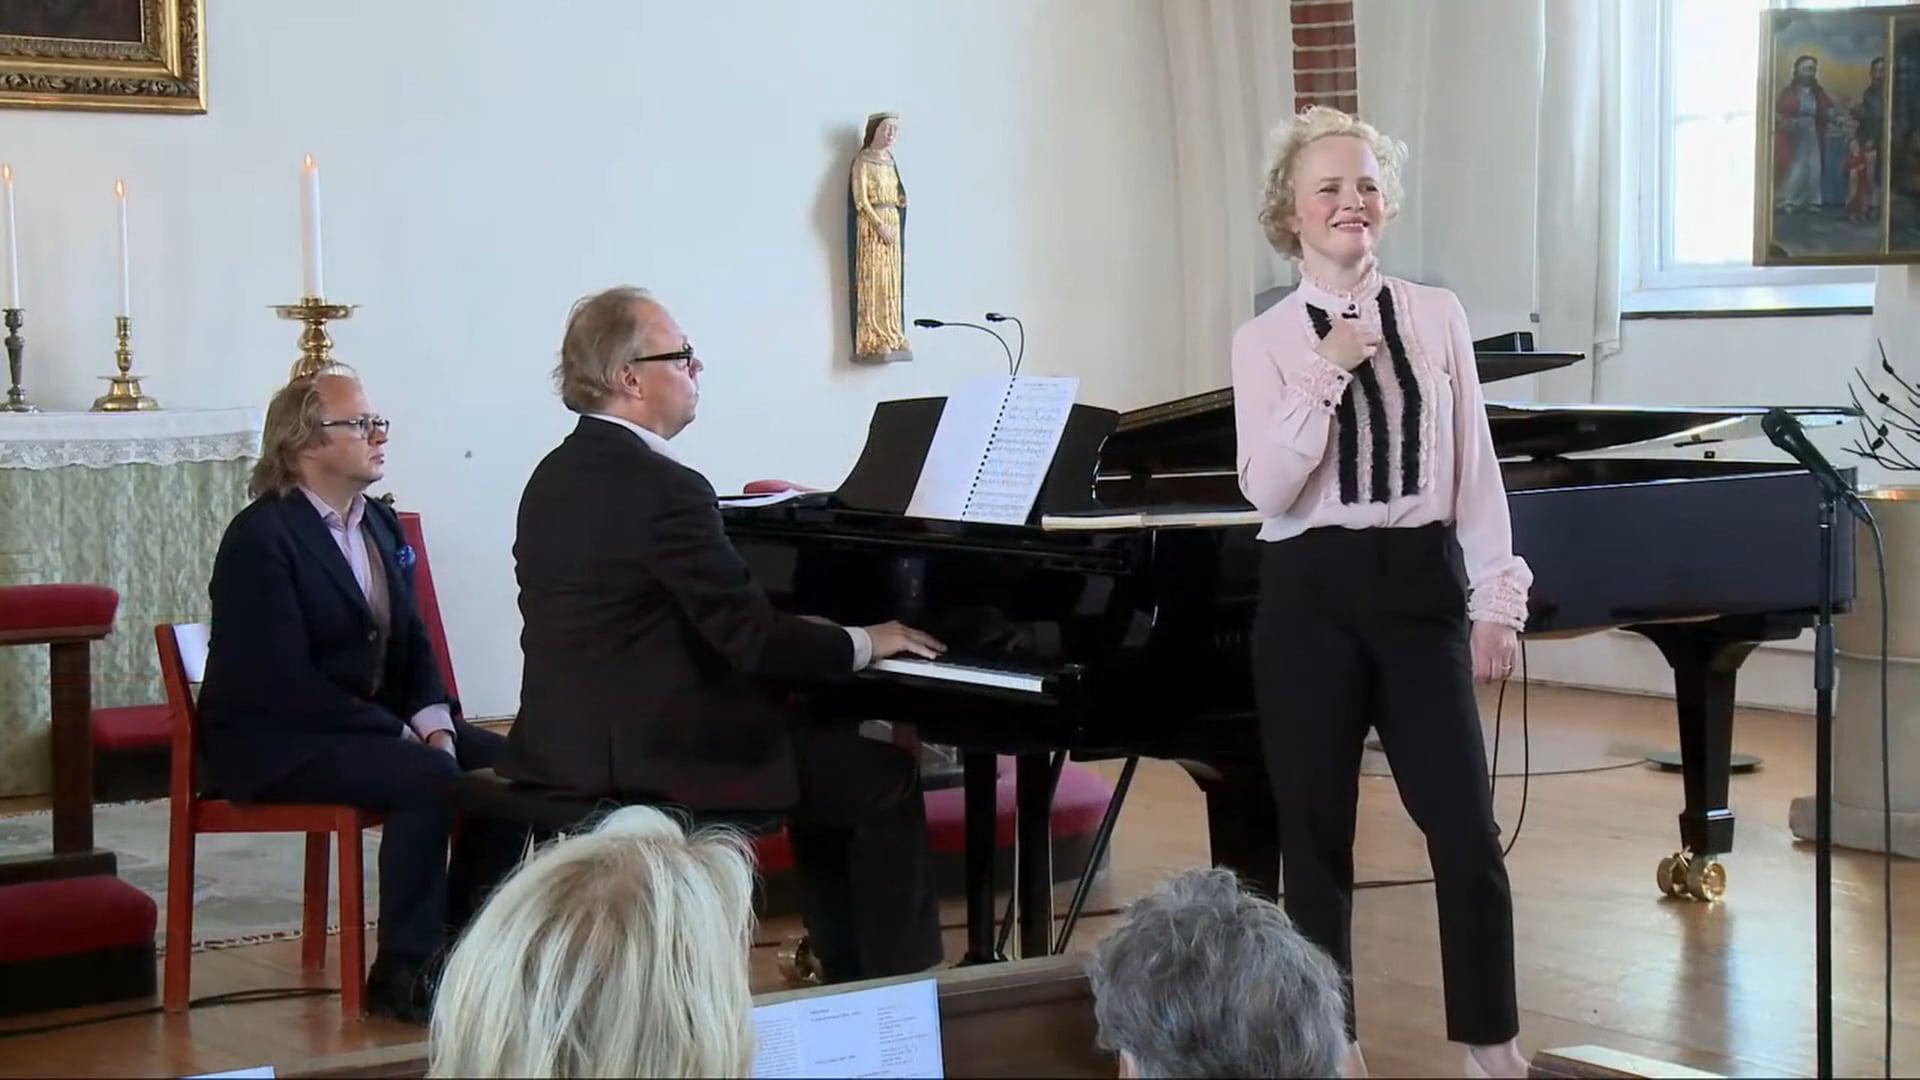 bastad kammarmusikfestival - torekovs kyrka 16-30